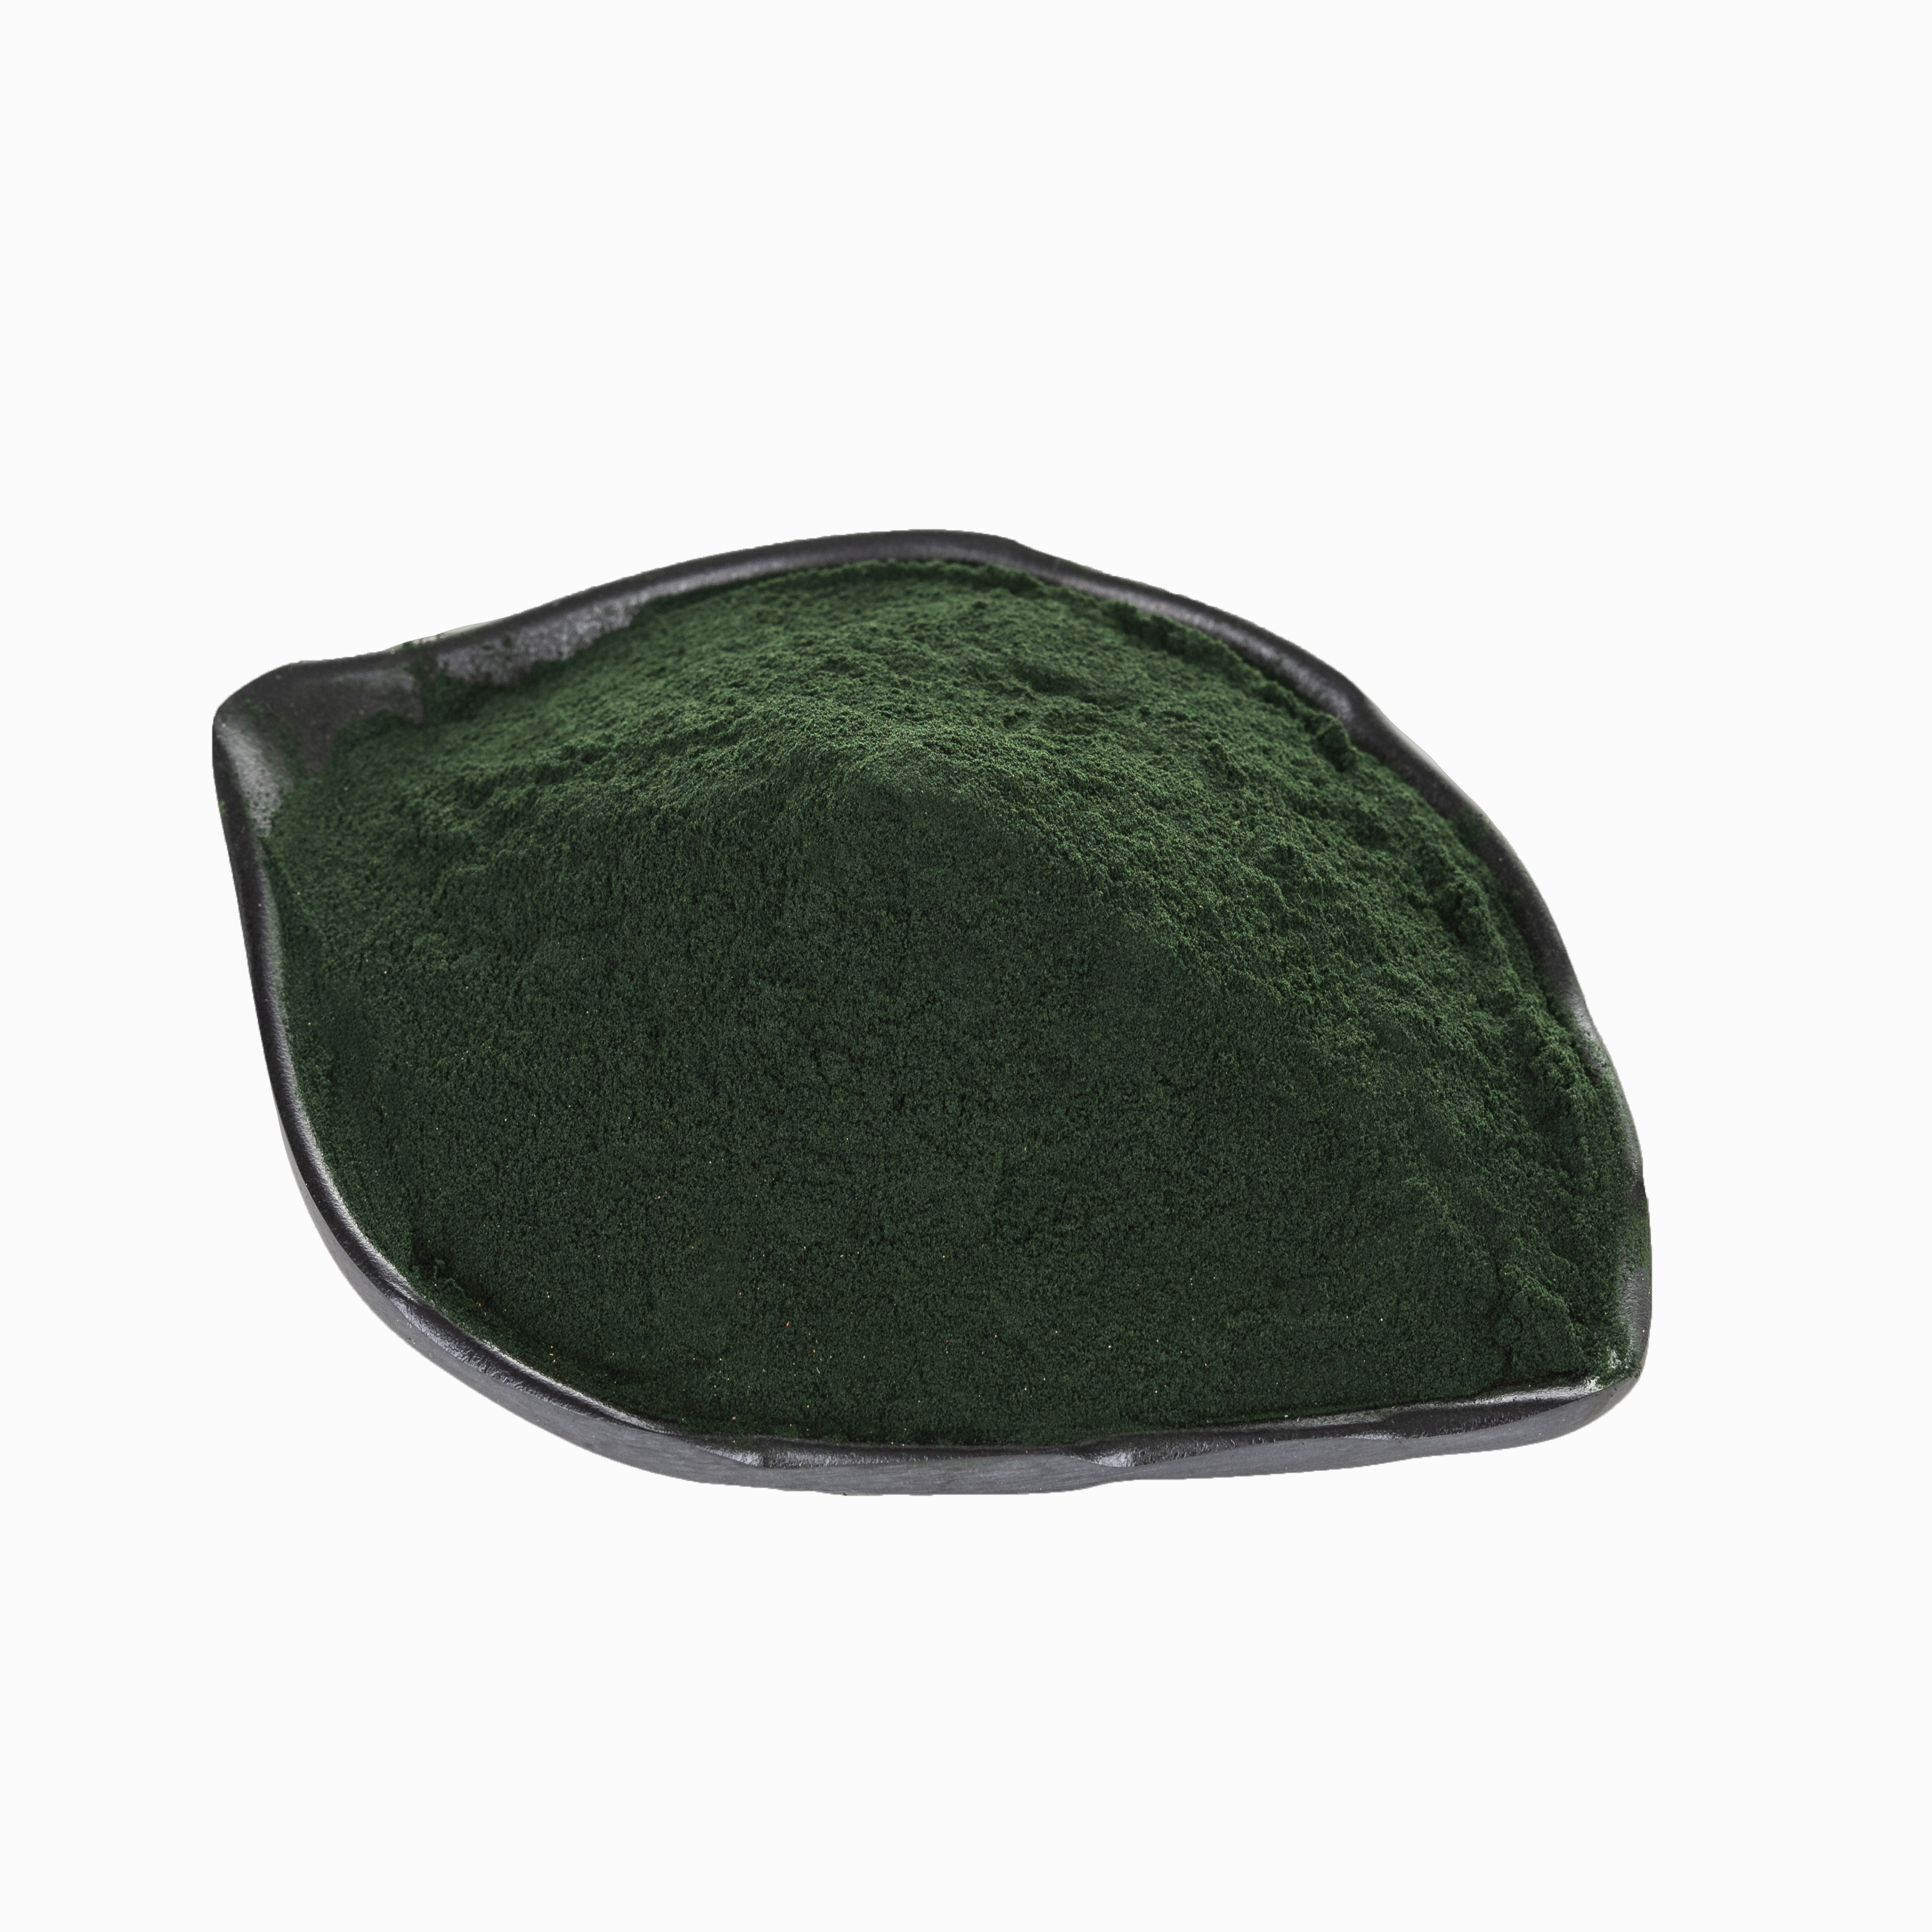 Produce and Provide Pure Natural Algae Animal Feed / Green Algae for Animal Feed